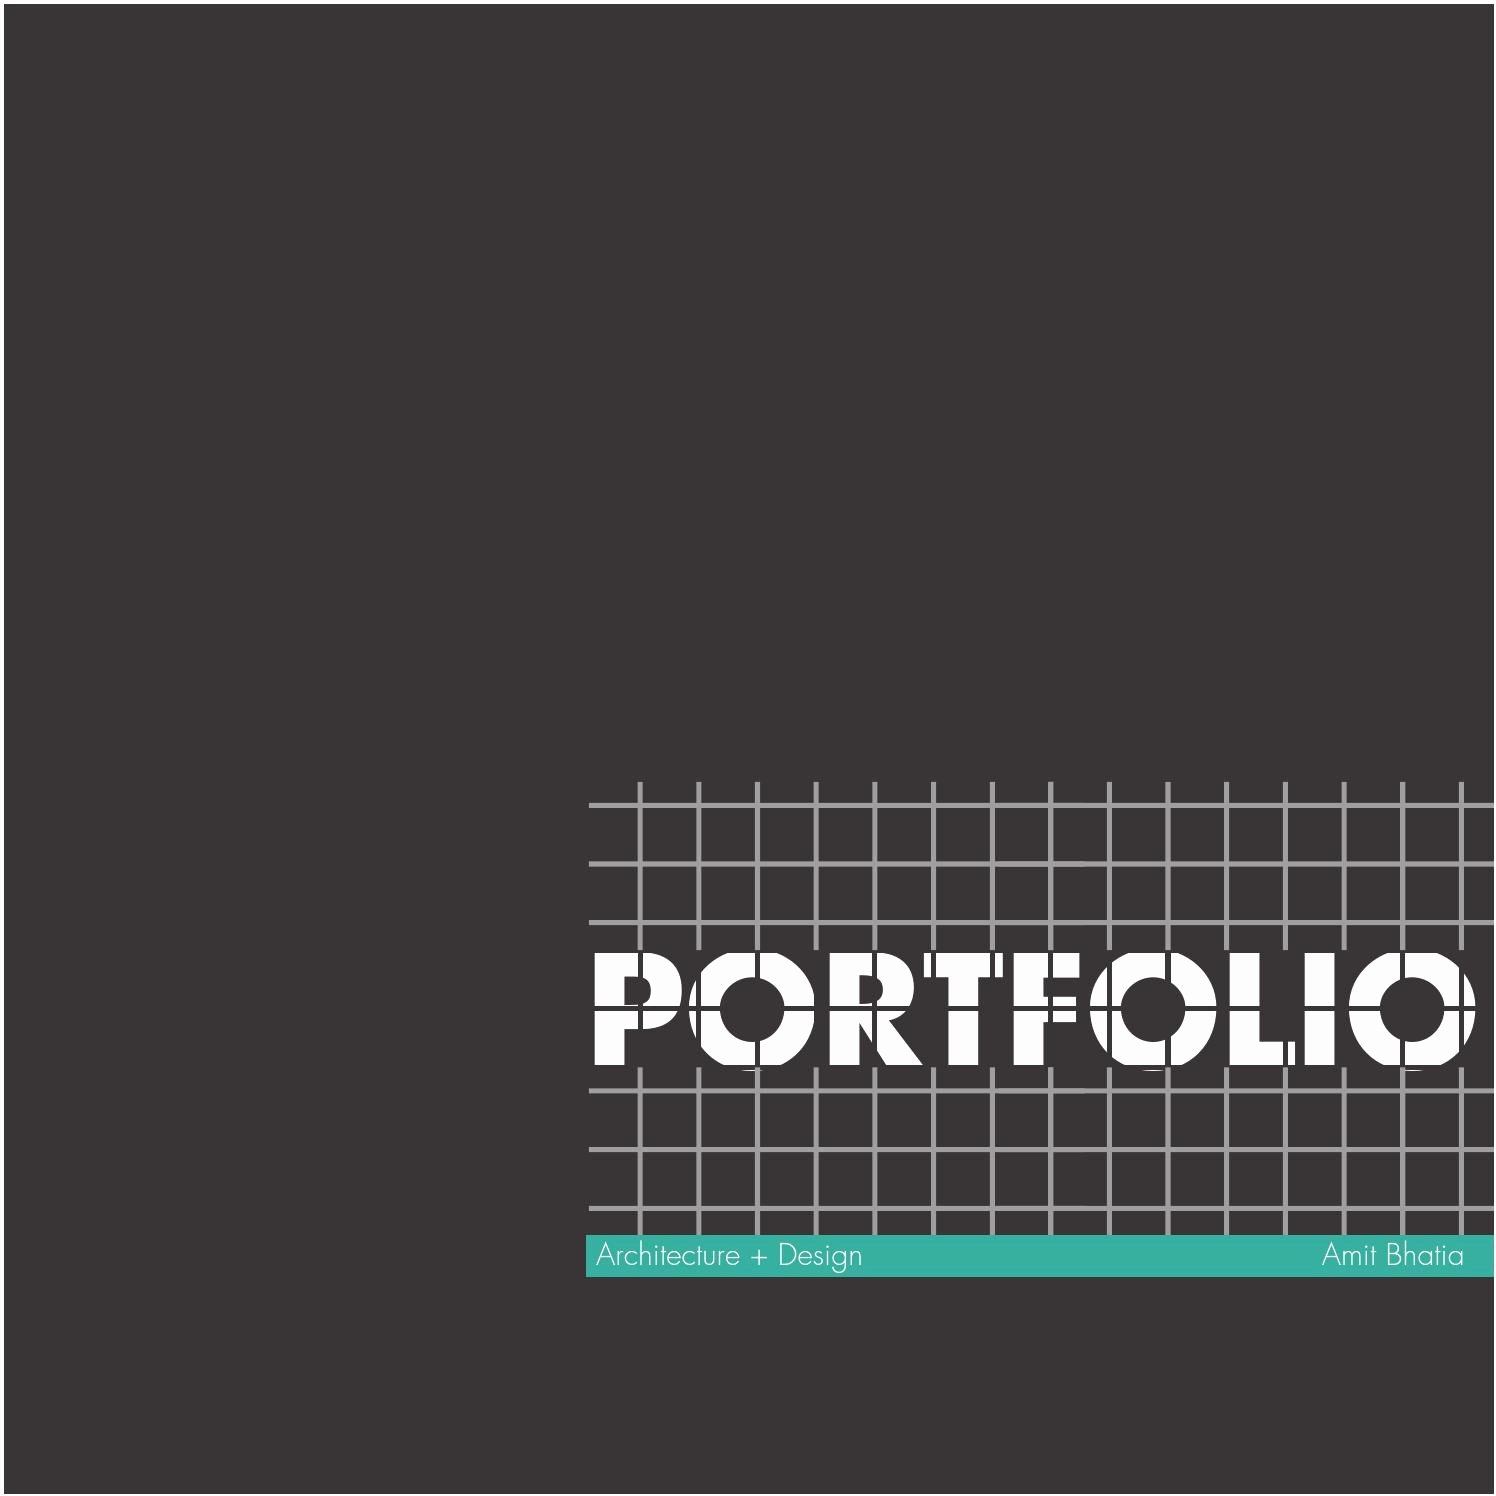 Portfolio Cover Page Templates Inspirational Architecture Portfolio Amit Bhatia by Amit Bhatia issuu